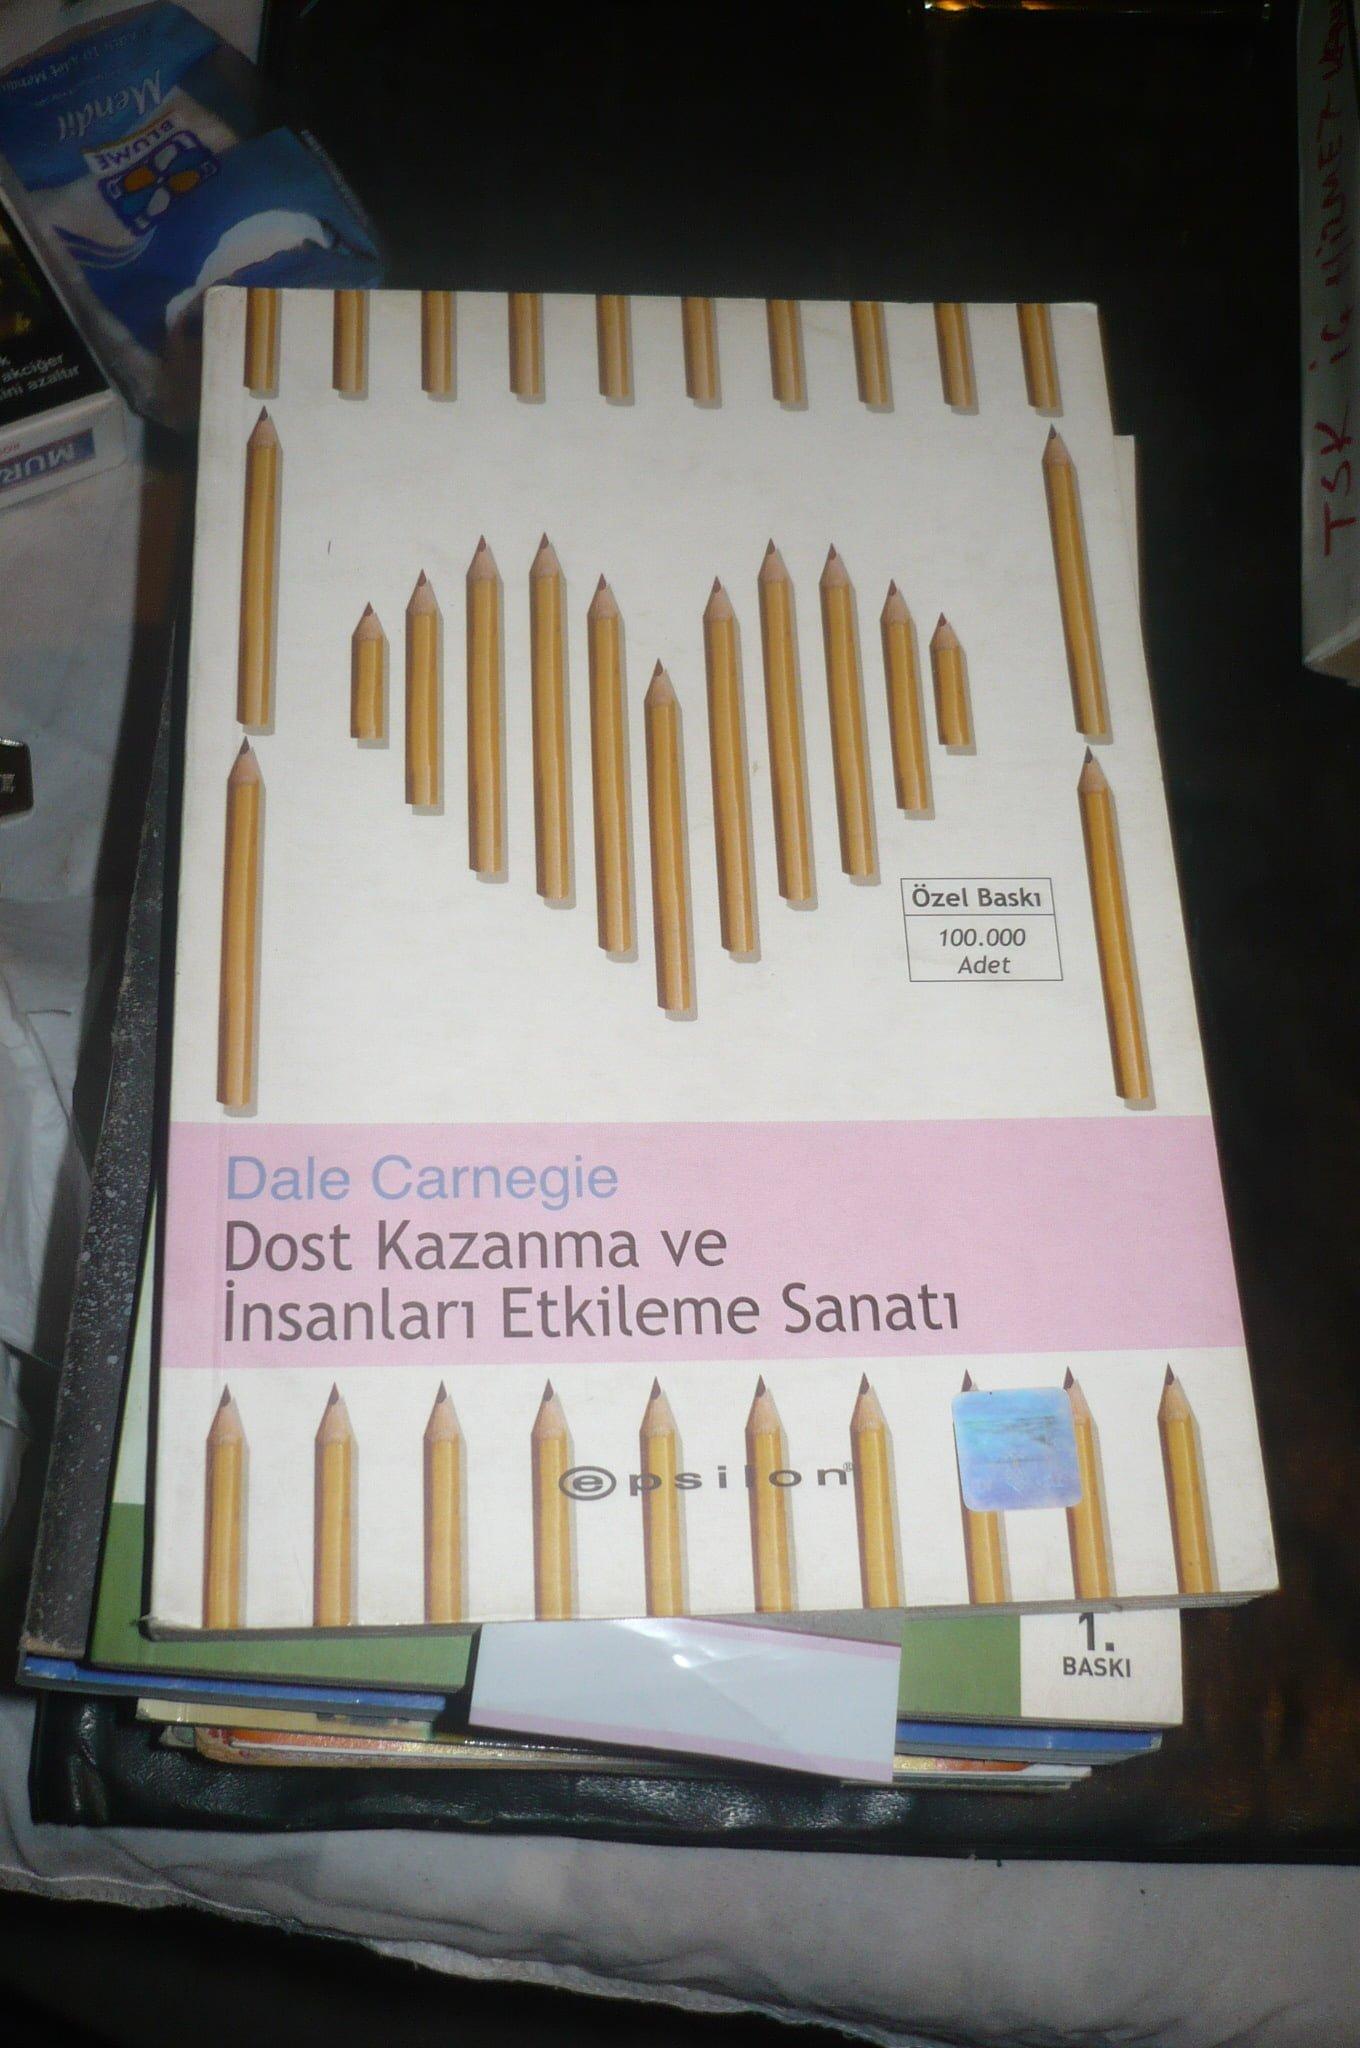 DOST KAZANMA VE İNSANLARI ETKİLEME SANATI/Dale Cargnegie 15 TL